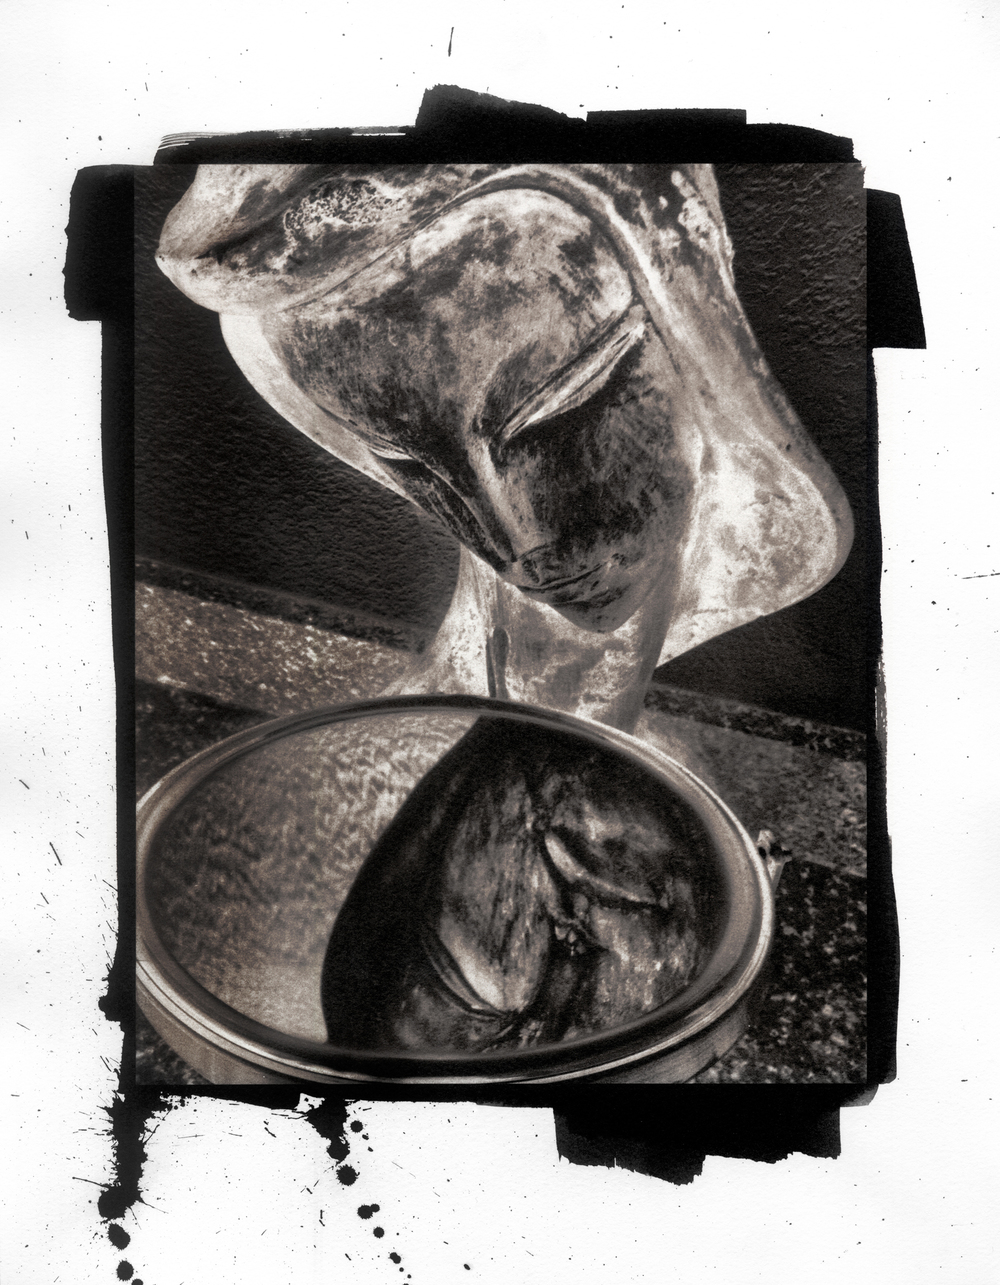 Vanity - 11x14 Platinum Print